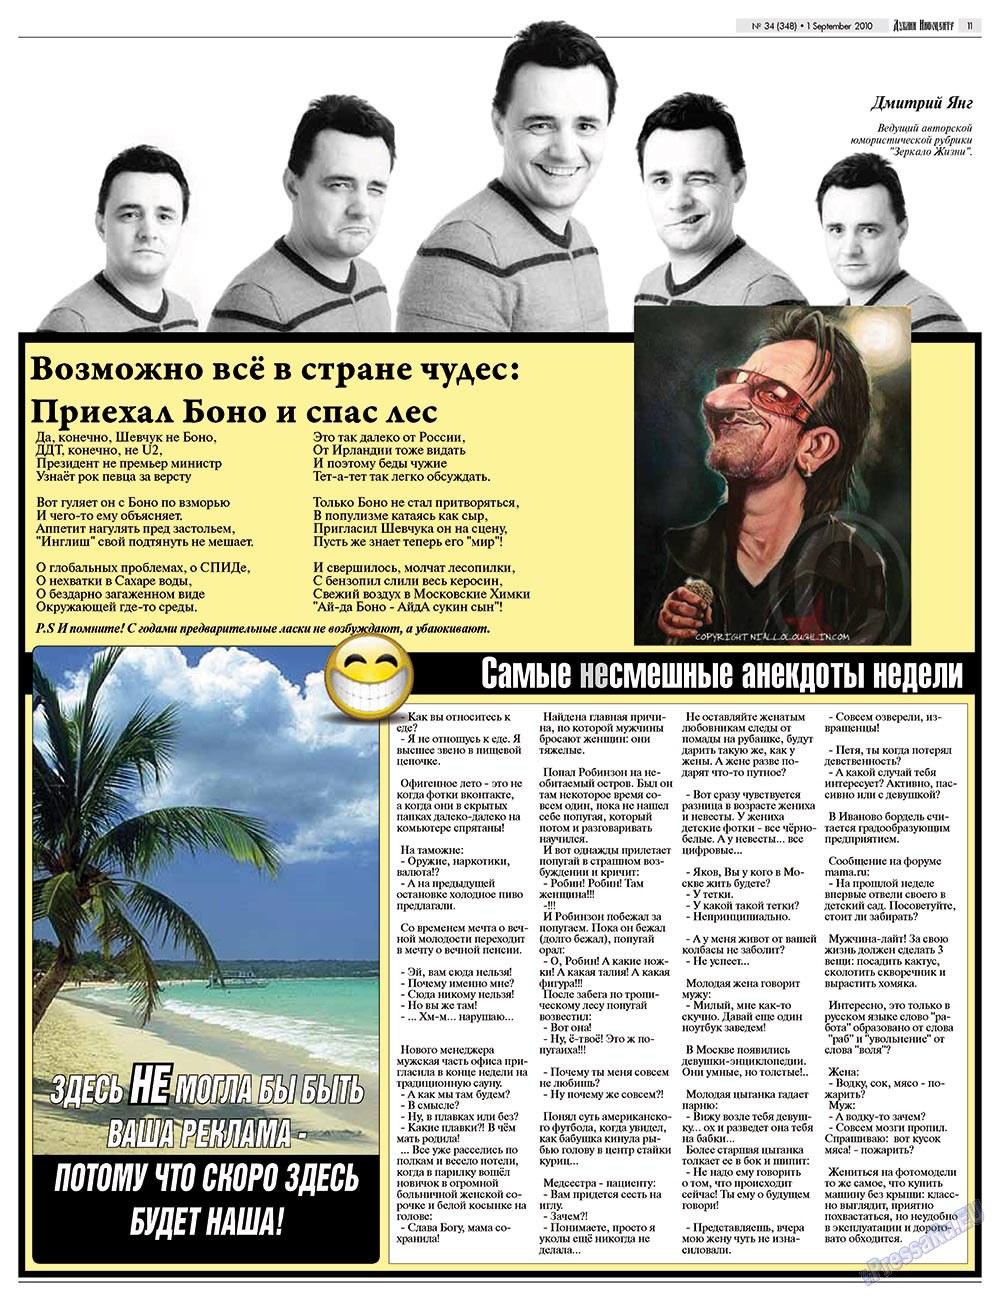 Дублин инфоцентр (газета). 2010 год, номер 34, стр. 11